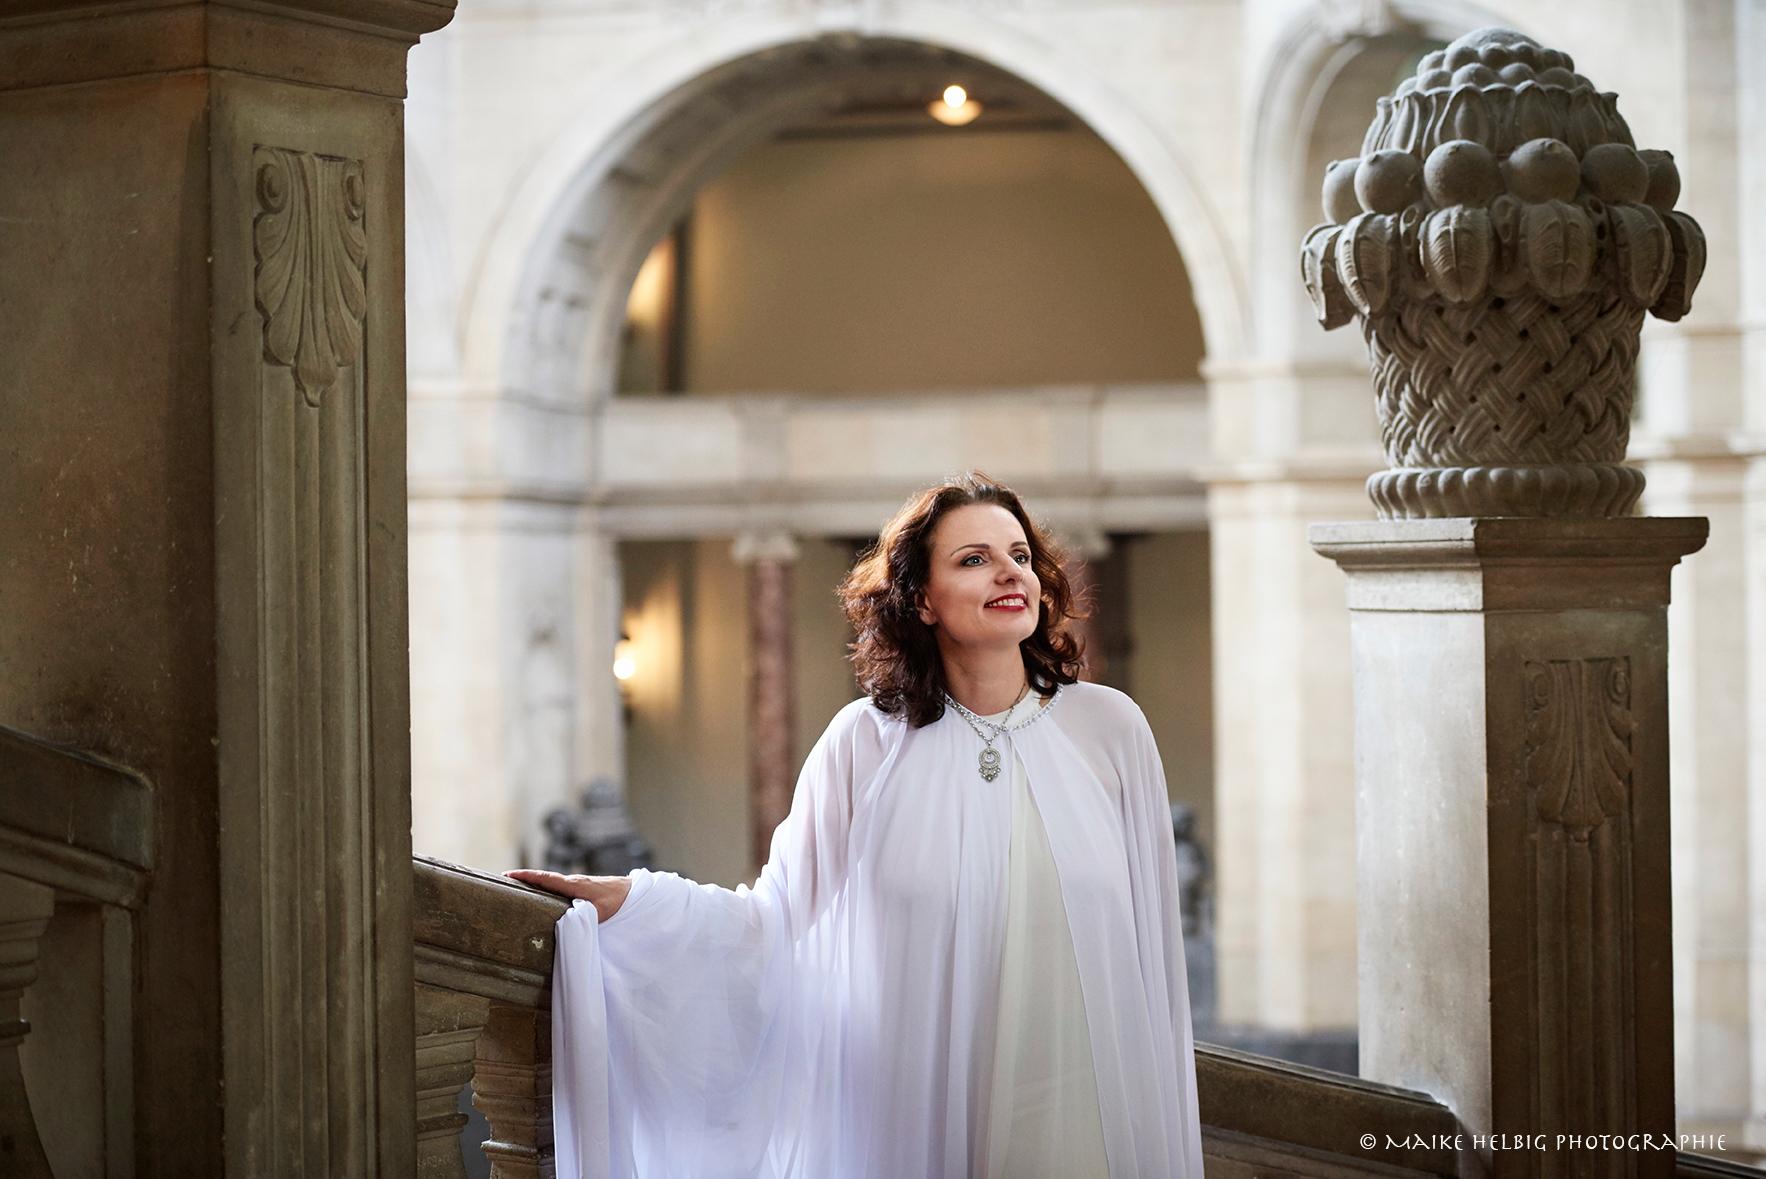 Katrin Iltgen - Hochzeitssängerin